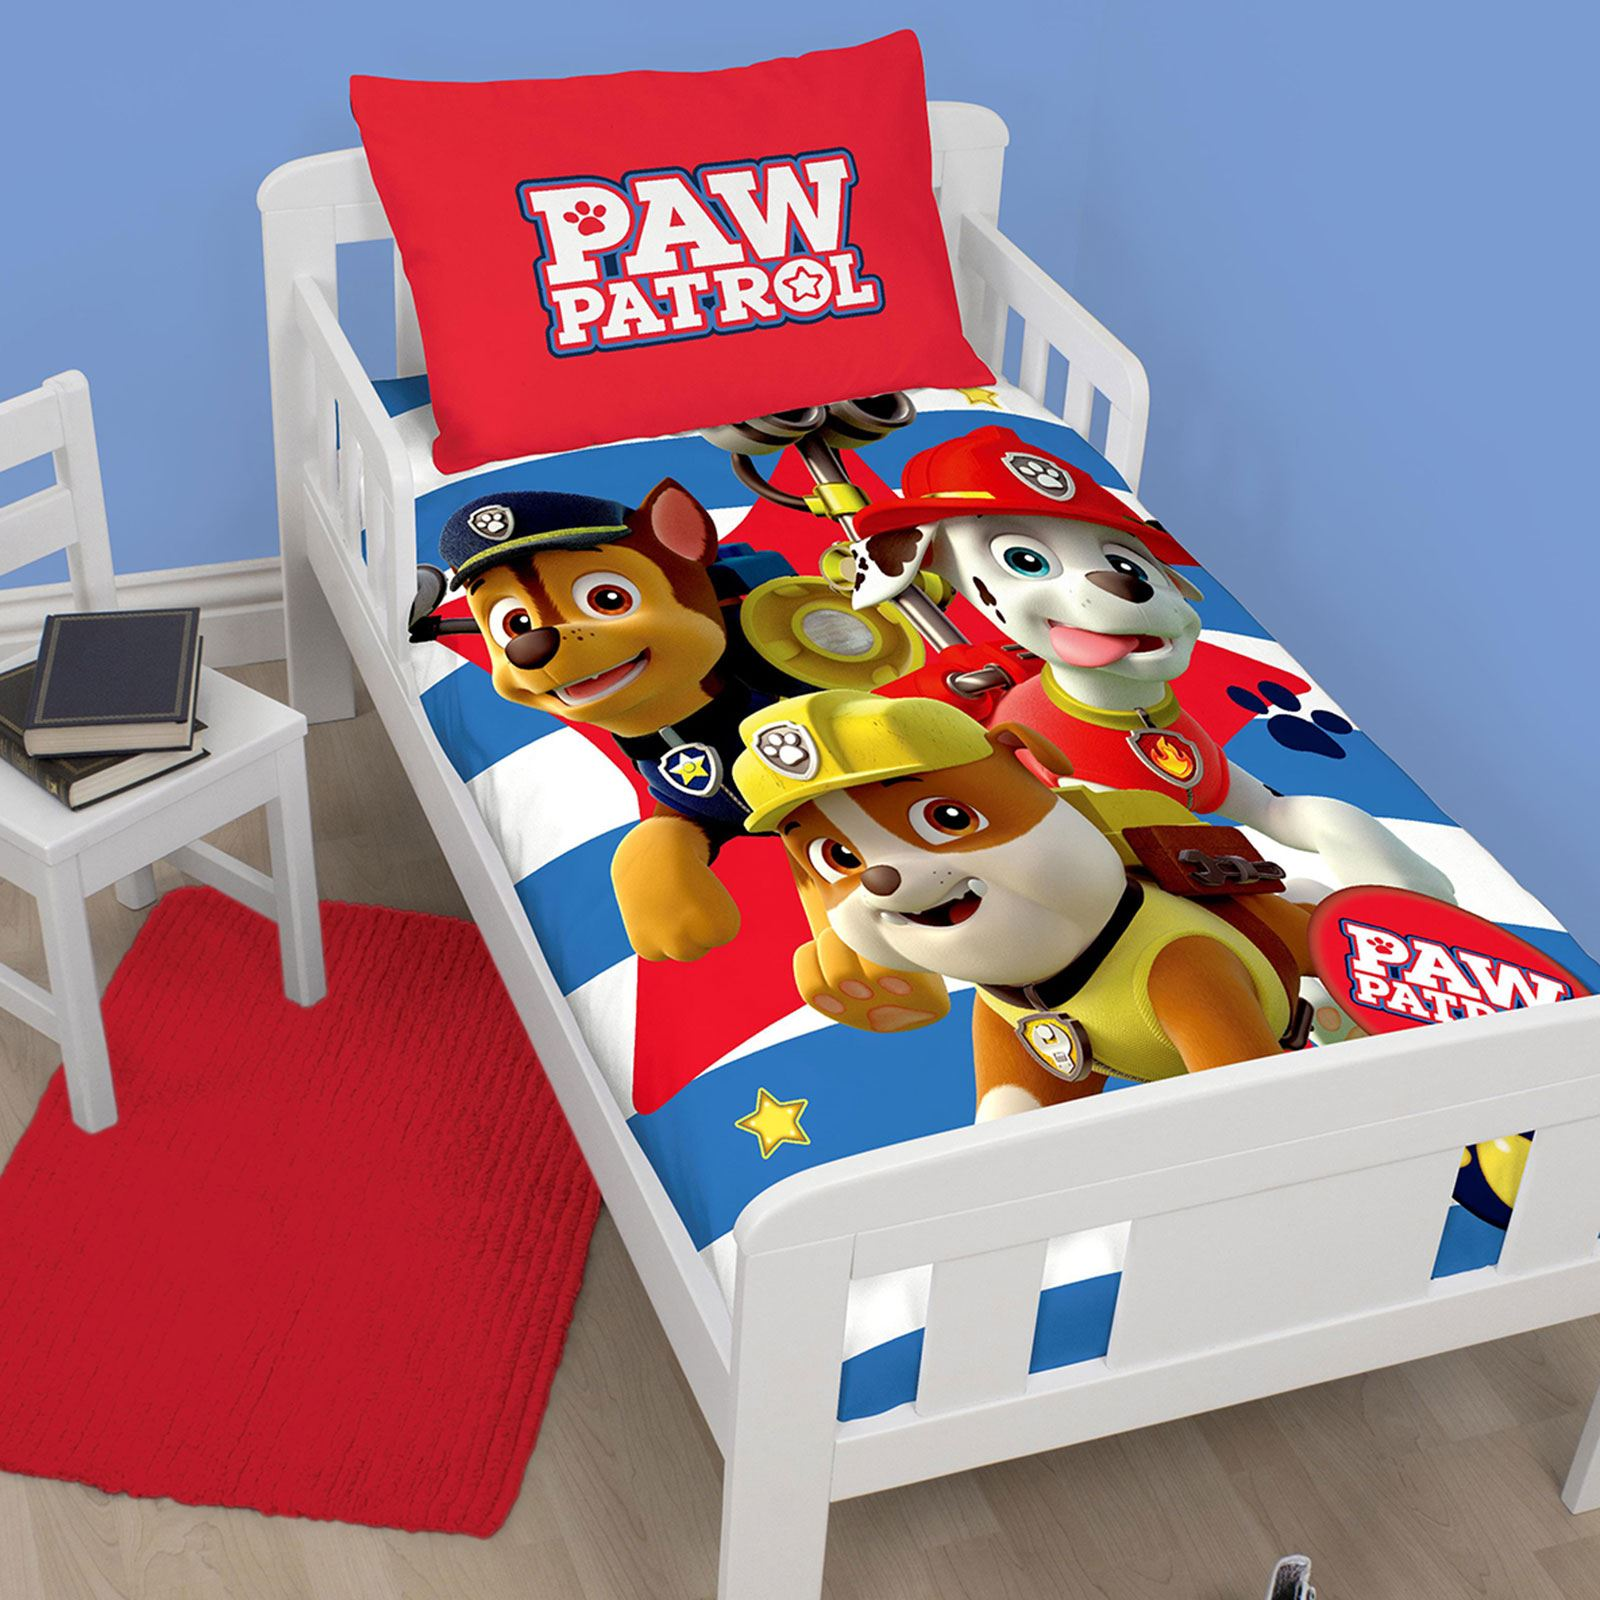 PAW PATROL OFFICIAL DUVET COVER SETS VARIOUS DESIGNS KIDS